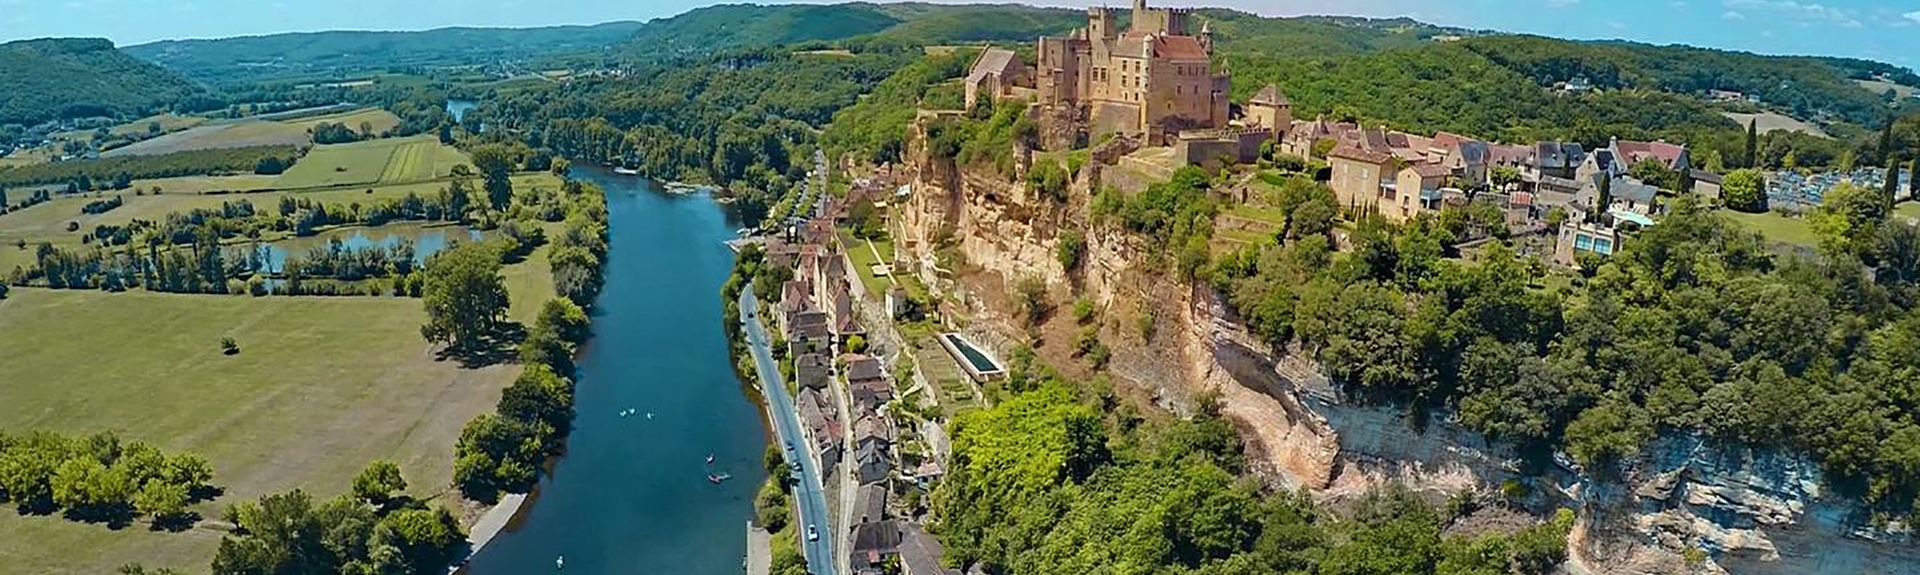 Saint-Felix-de-Villadeix, Dordogne, France